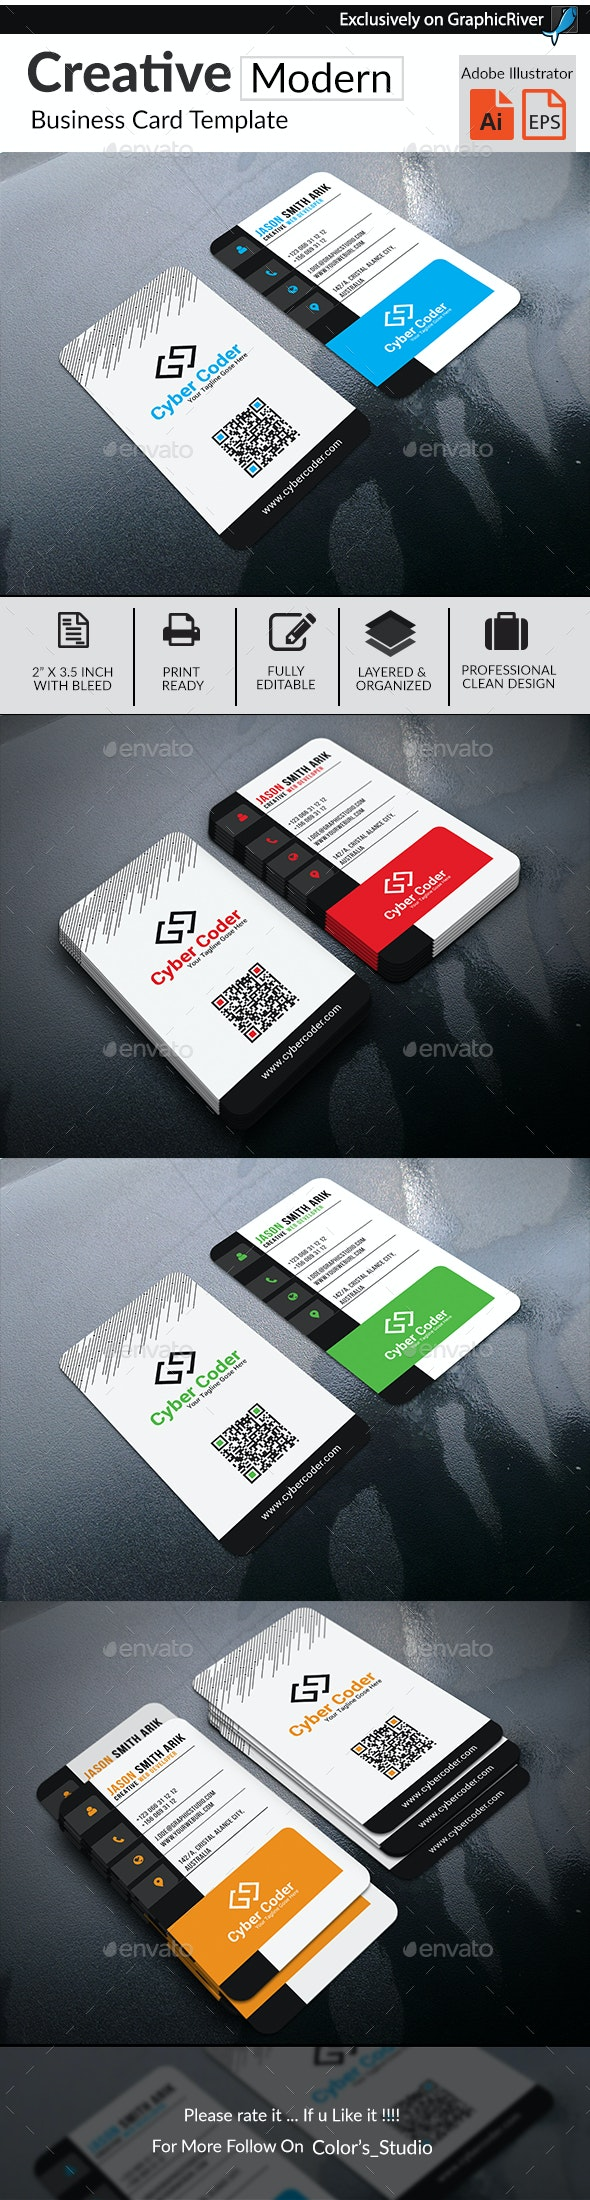 Creative Modern Business Card - Business Cards Print Templates